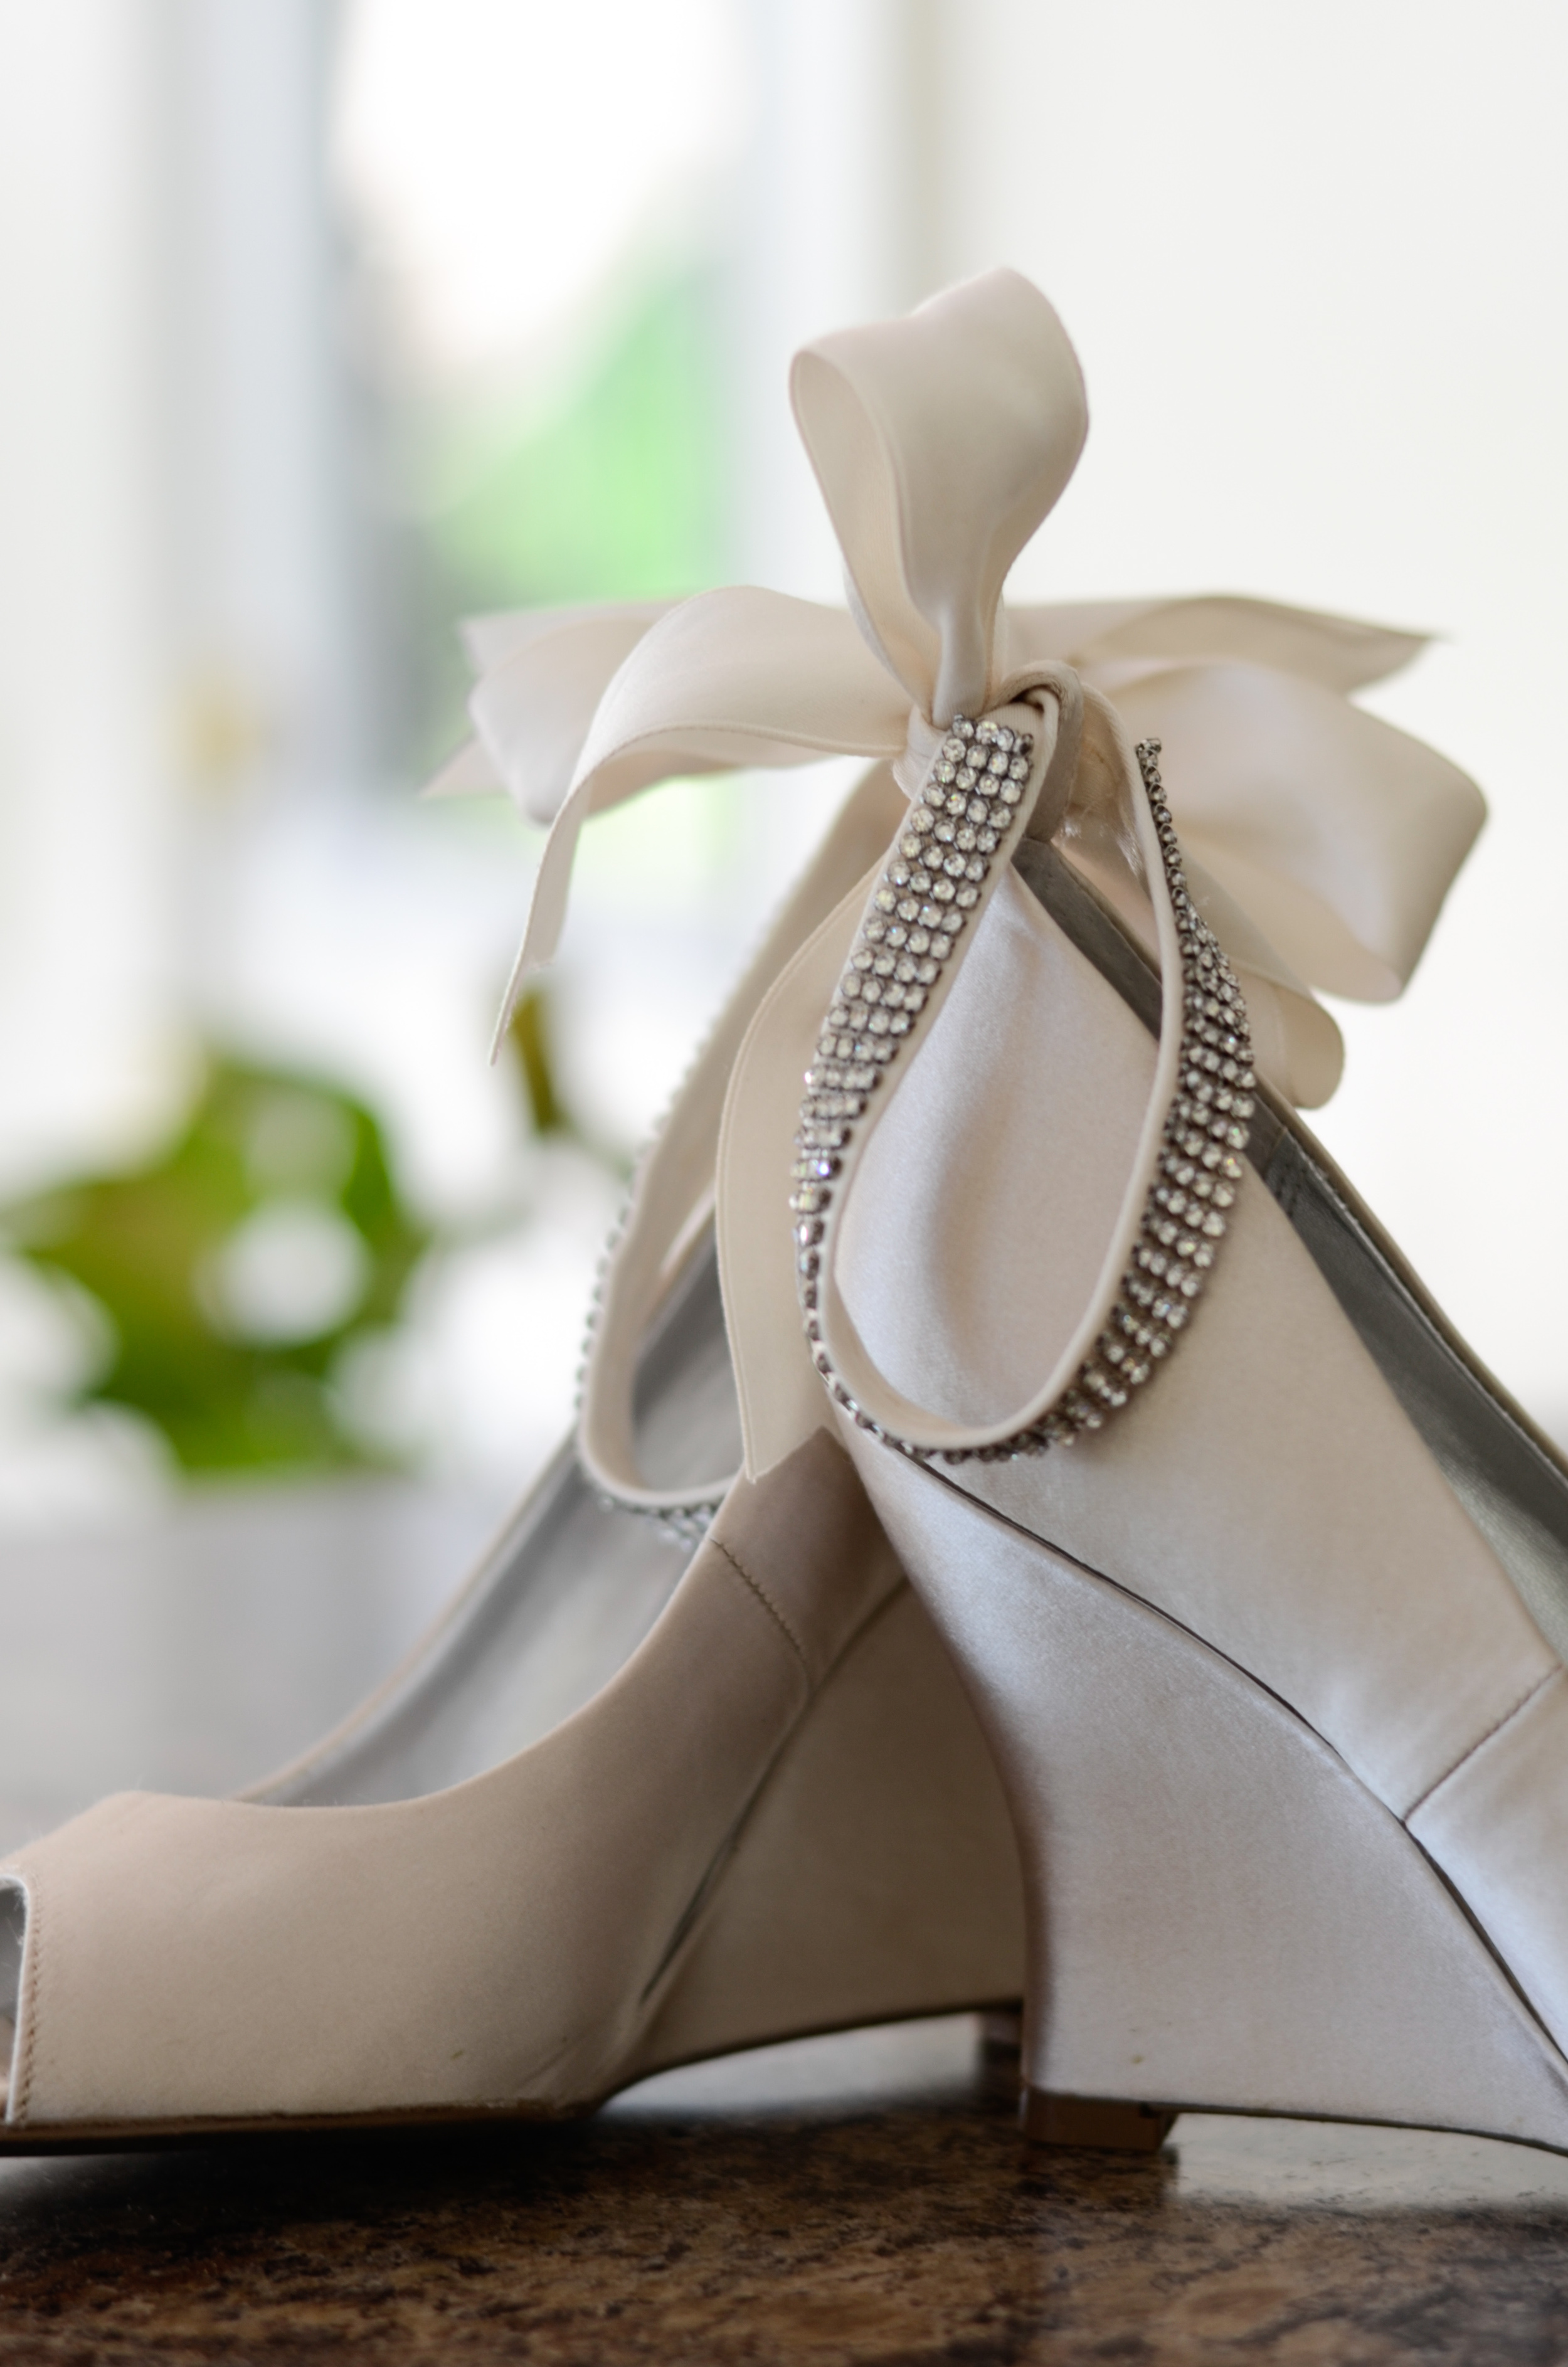 Satin bowedand rhinestone ivory wedge heels were the shoe of choice for Anna.